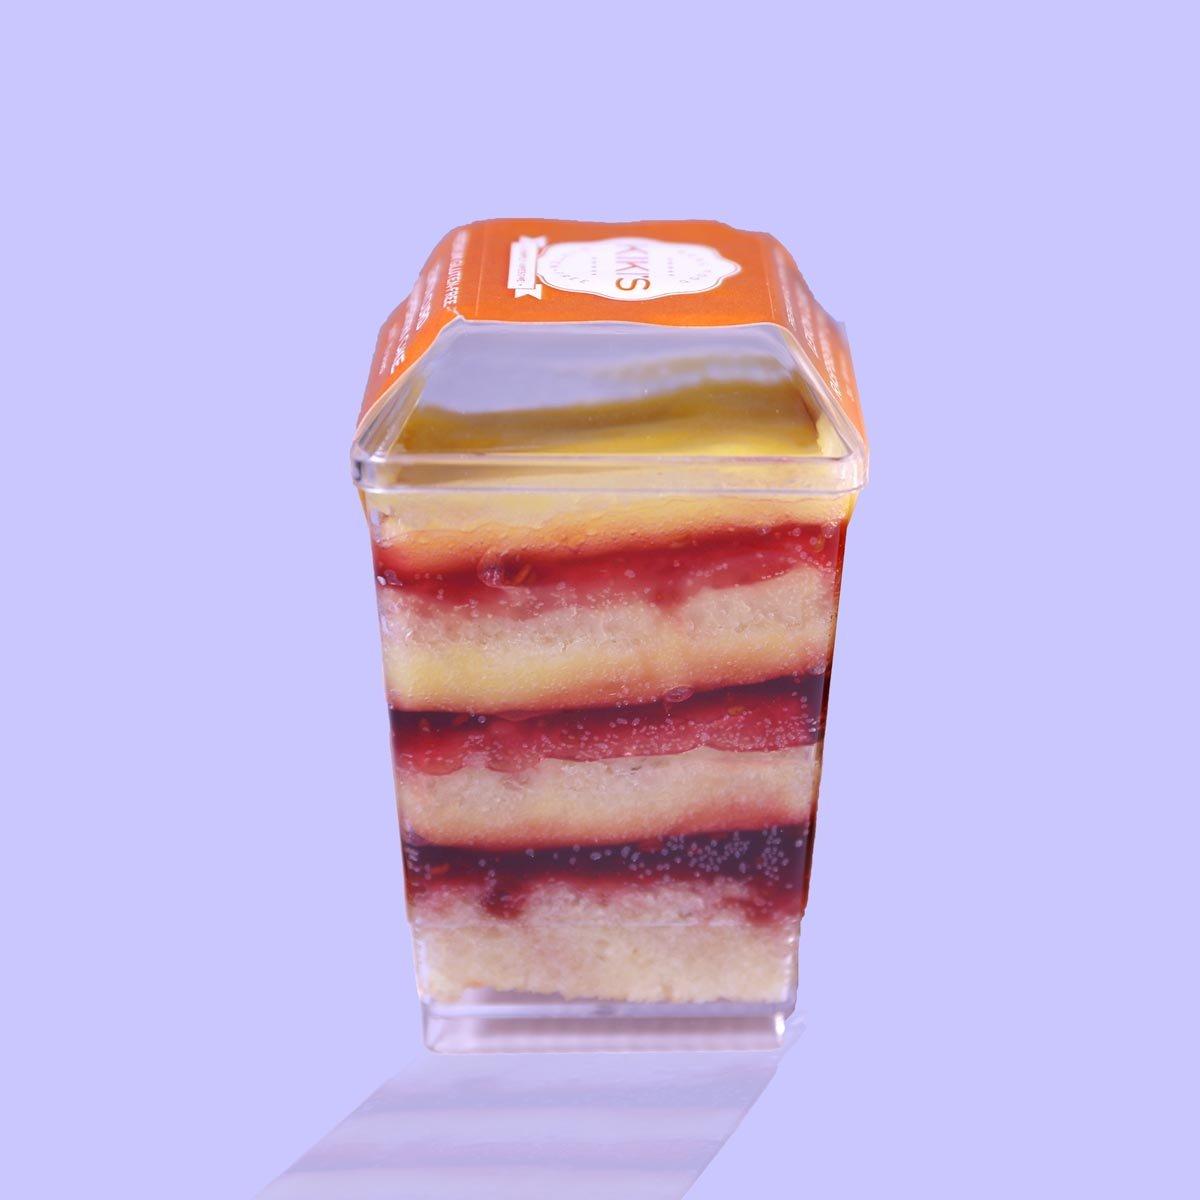 Kiki's Lemon Curd Raspberry Cake Feature